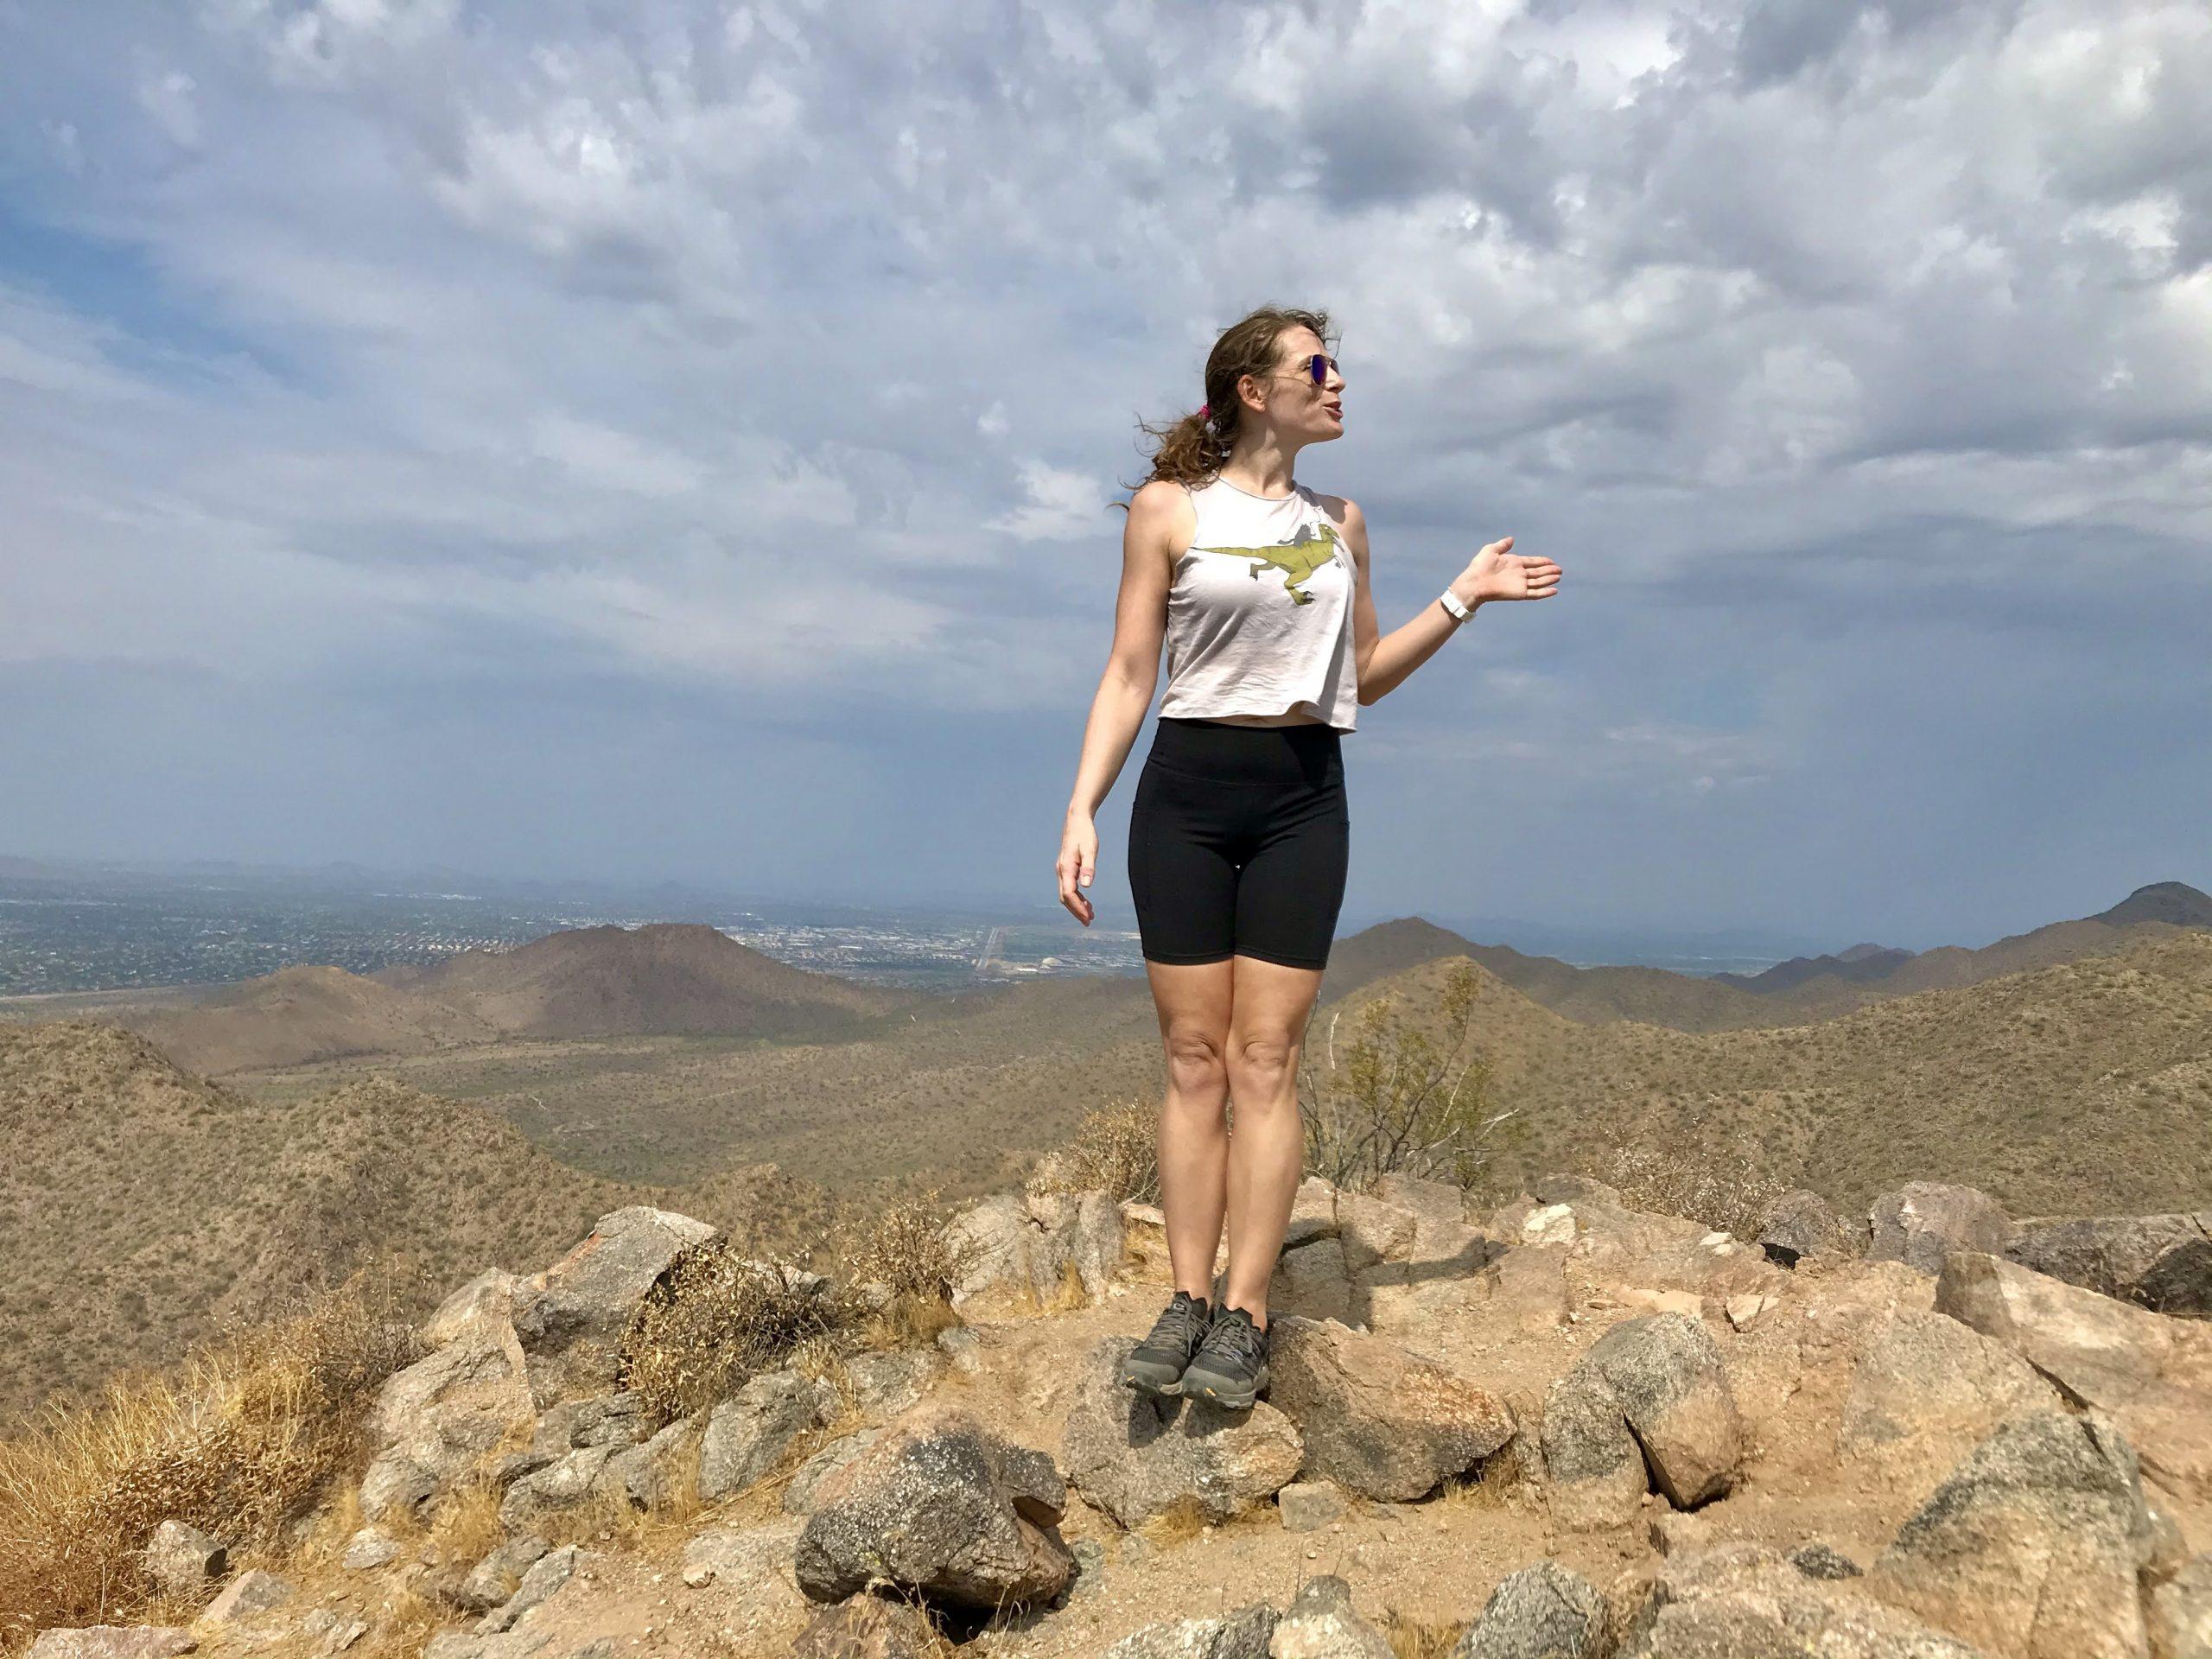 Sunrise Trail Hike tour guide